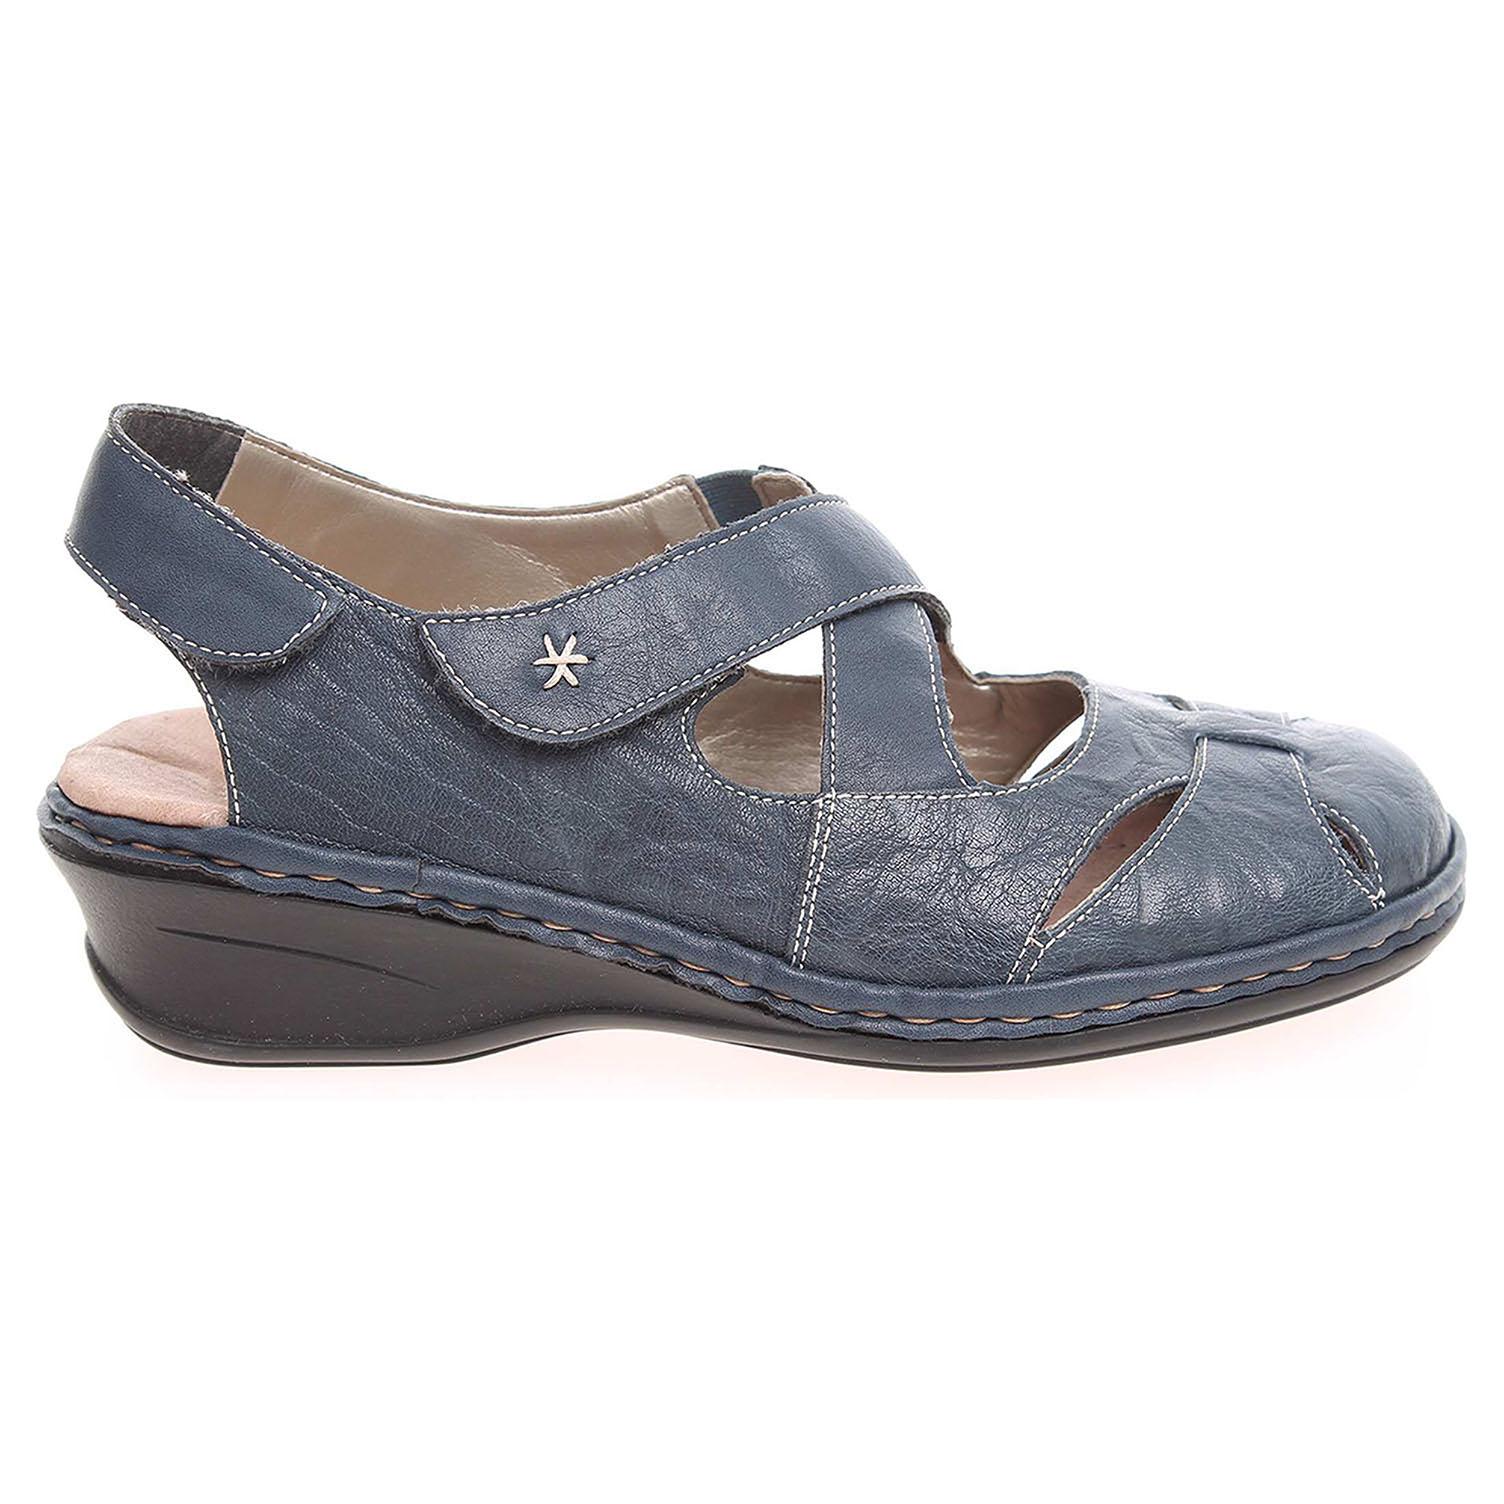 Rieker dámské sandály 66259-14 modré 37